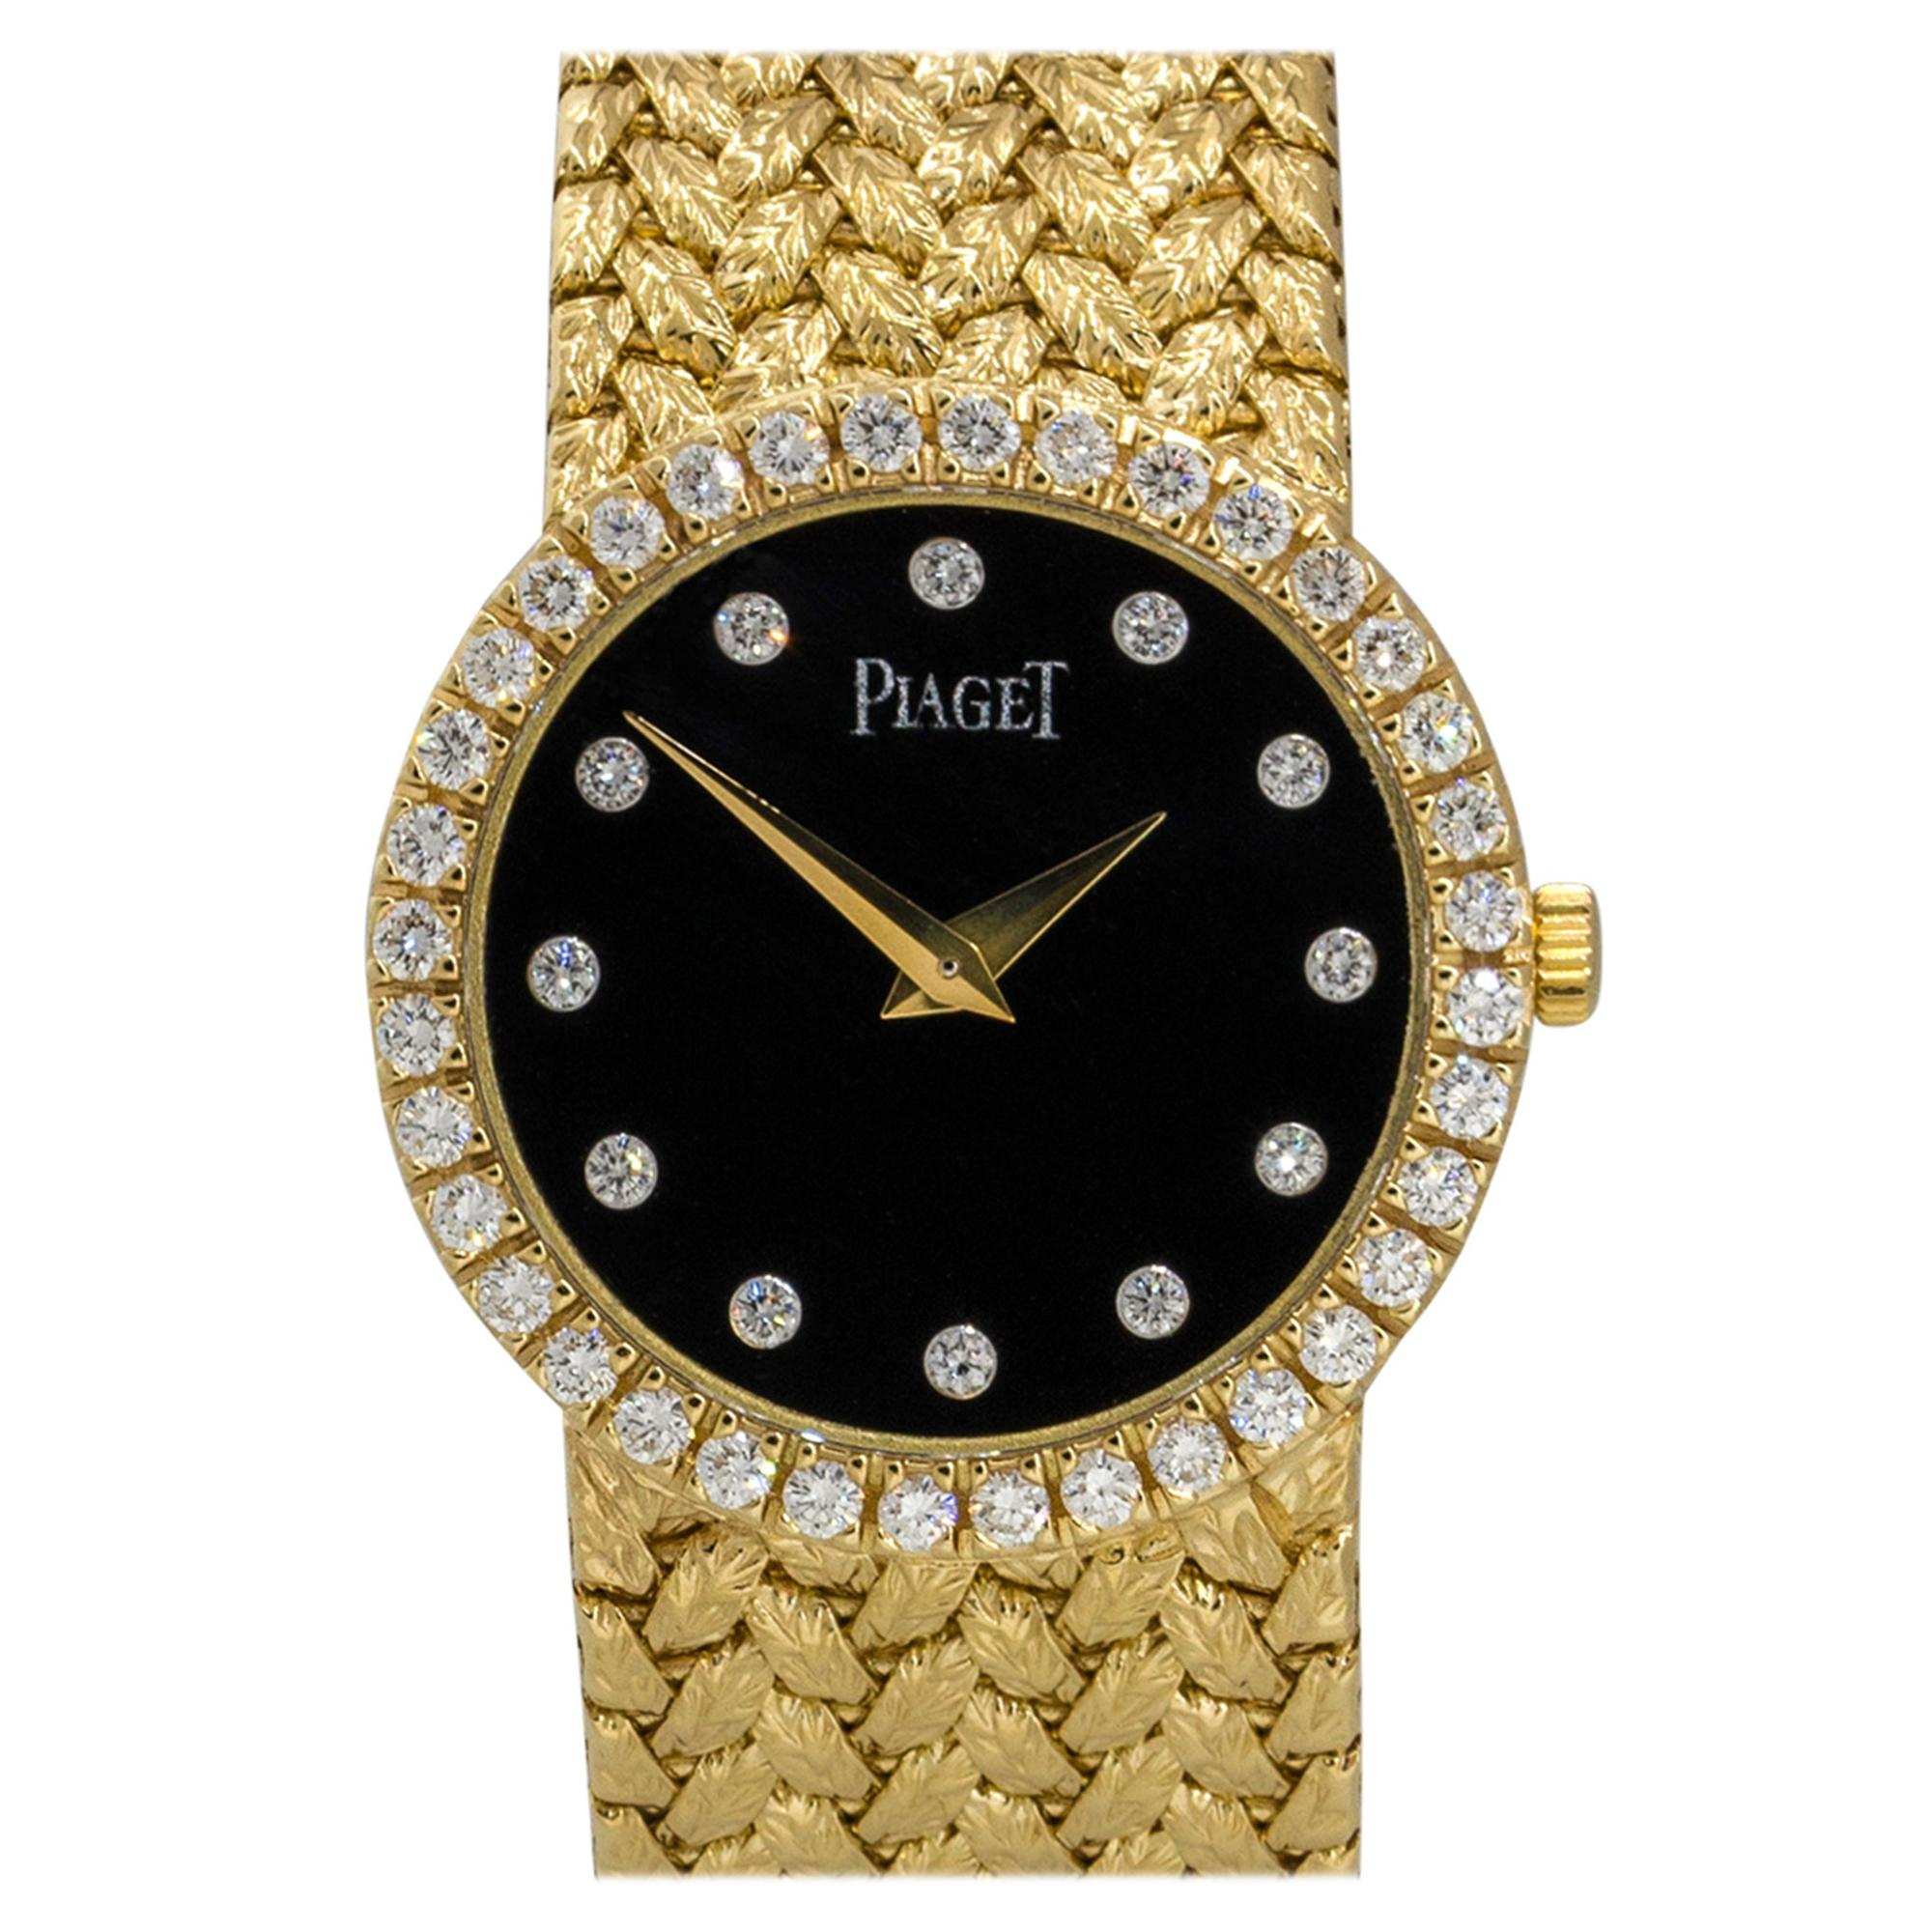 Piaget 8706D2 18k Yellow Gold Black Onyx Diamond Ladies Watch